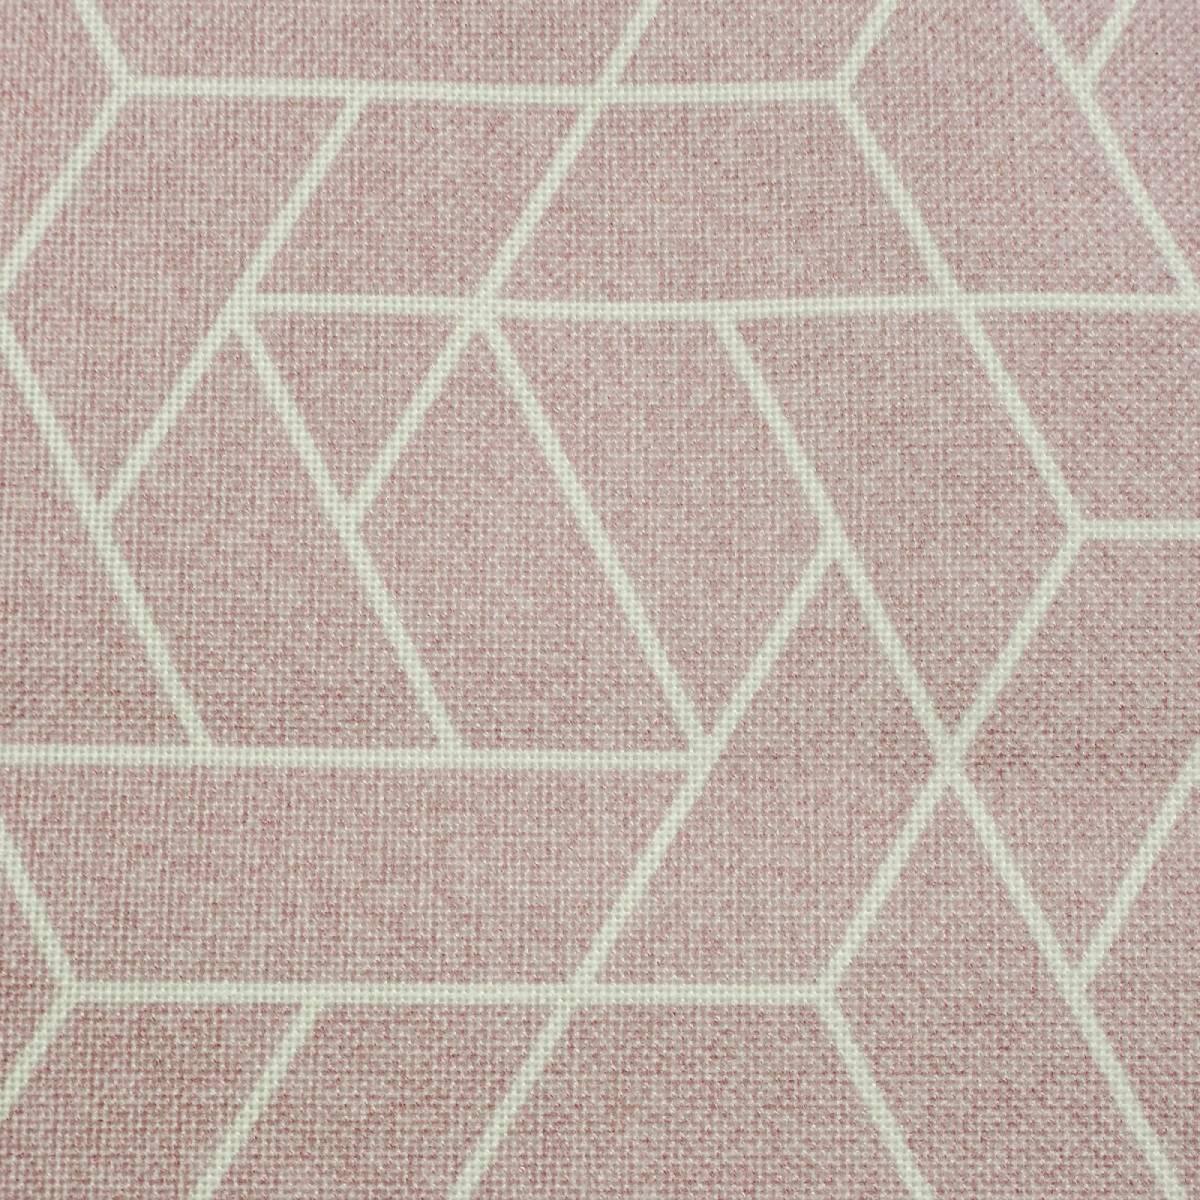 Tenda a pacchetto Geometric rosa 165x175 cm - 3